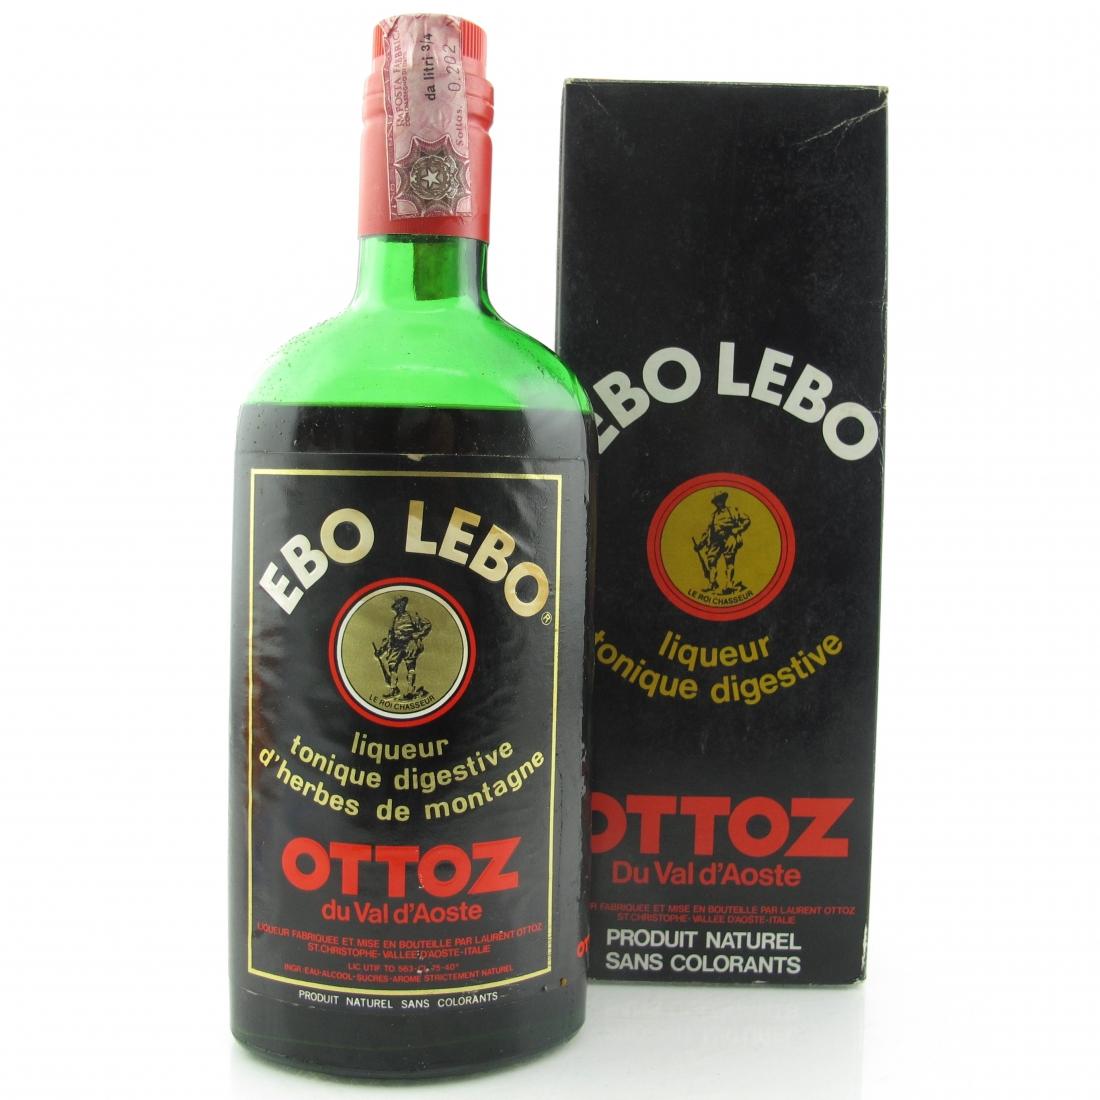 Ebo Lebo Ottoz du val d'Aoste 1970s